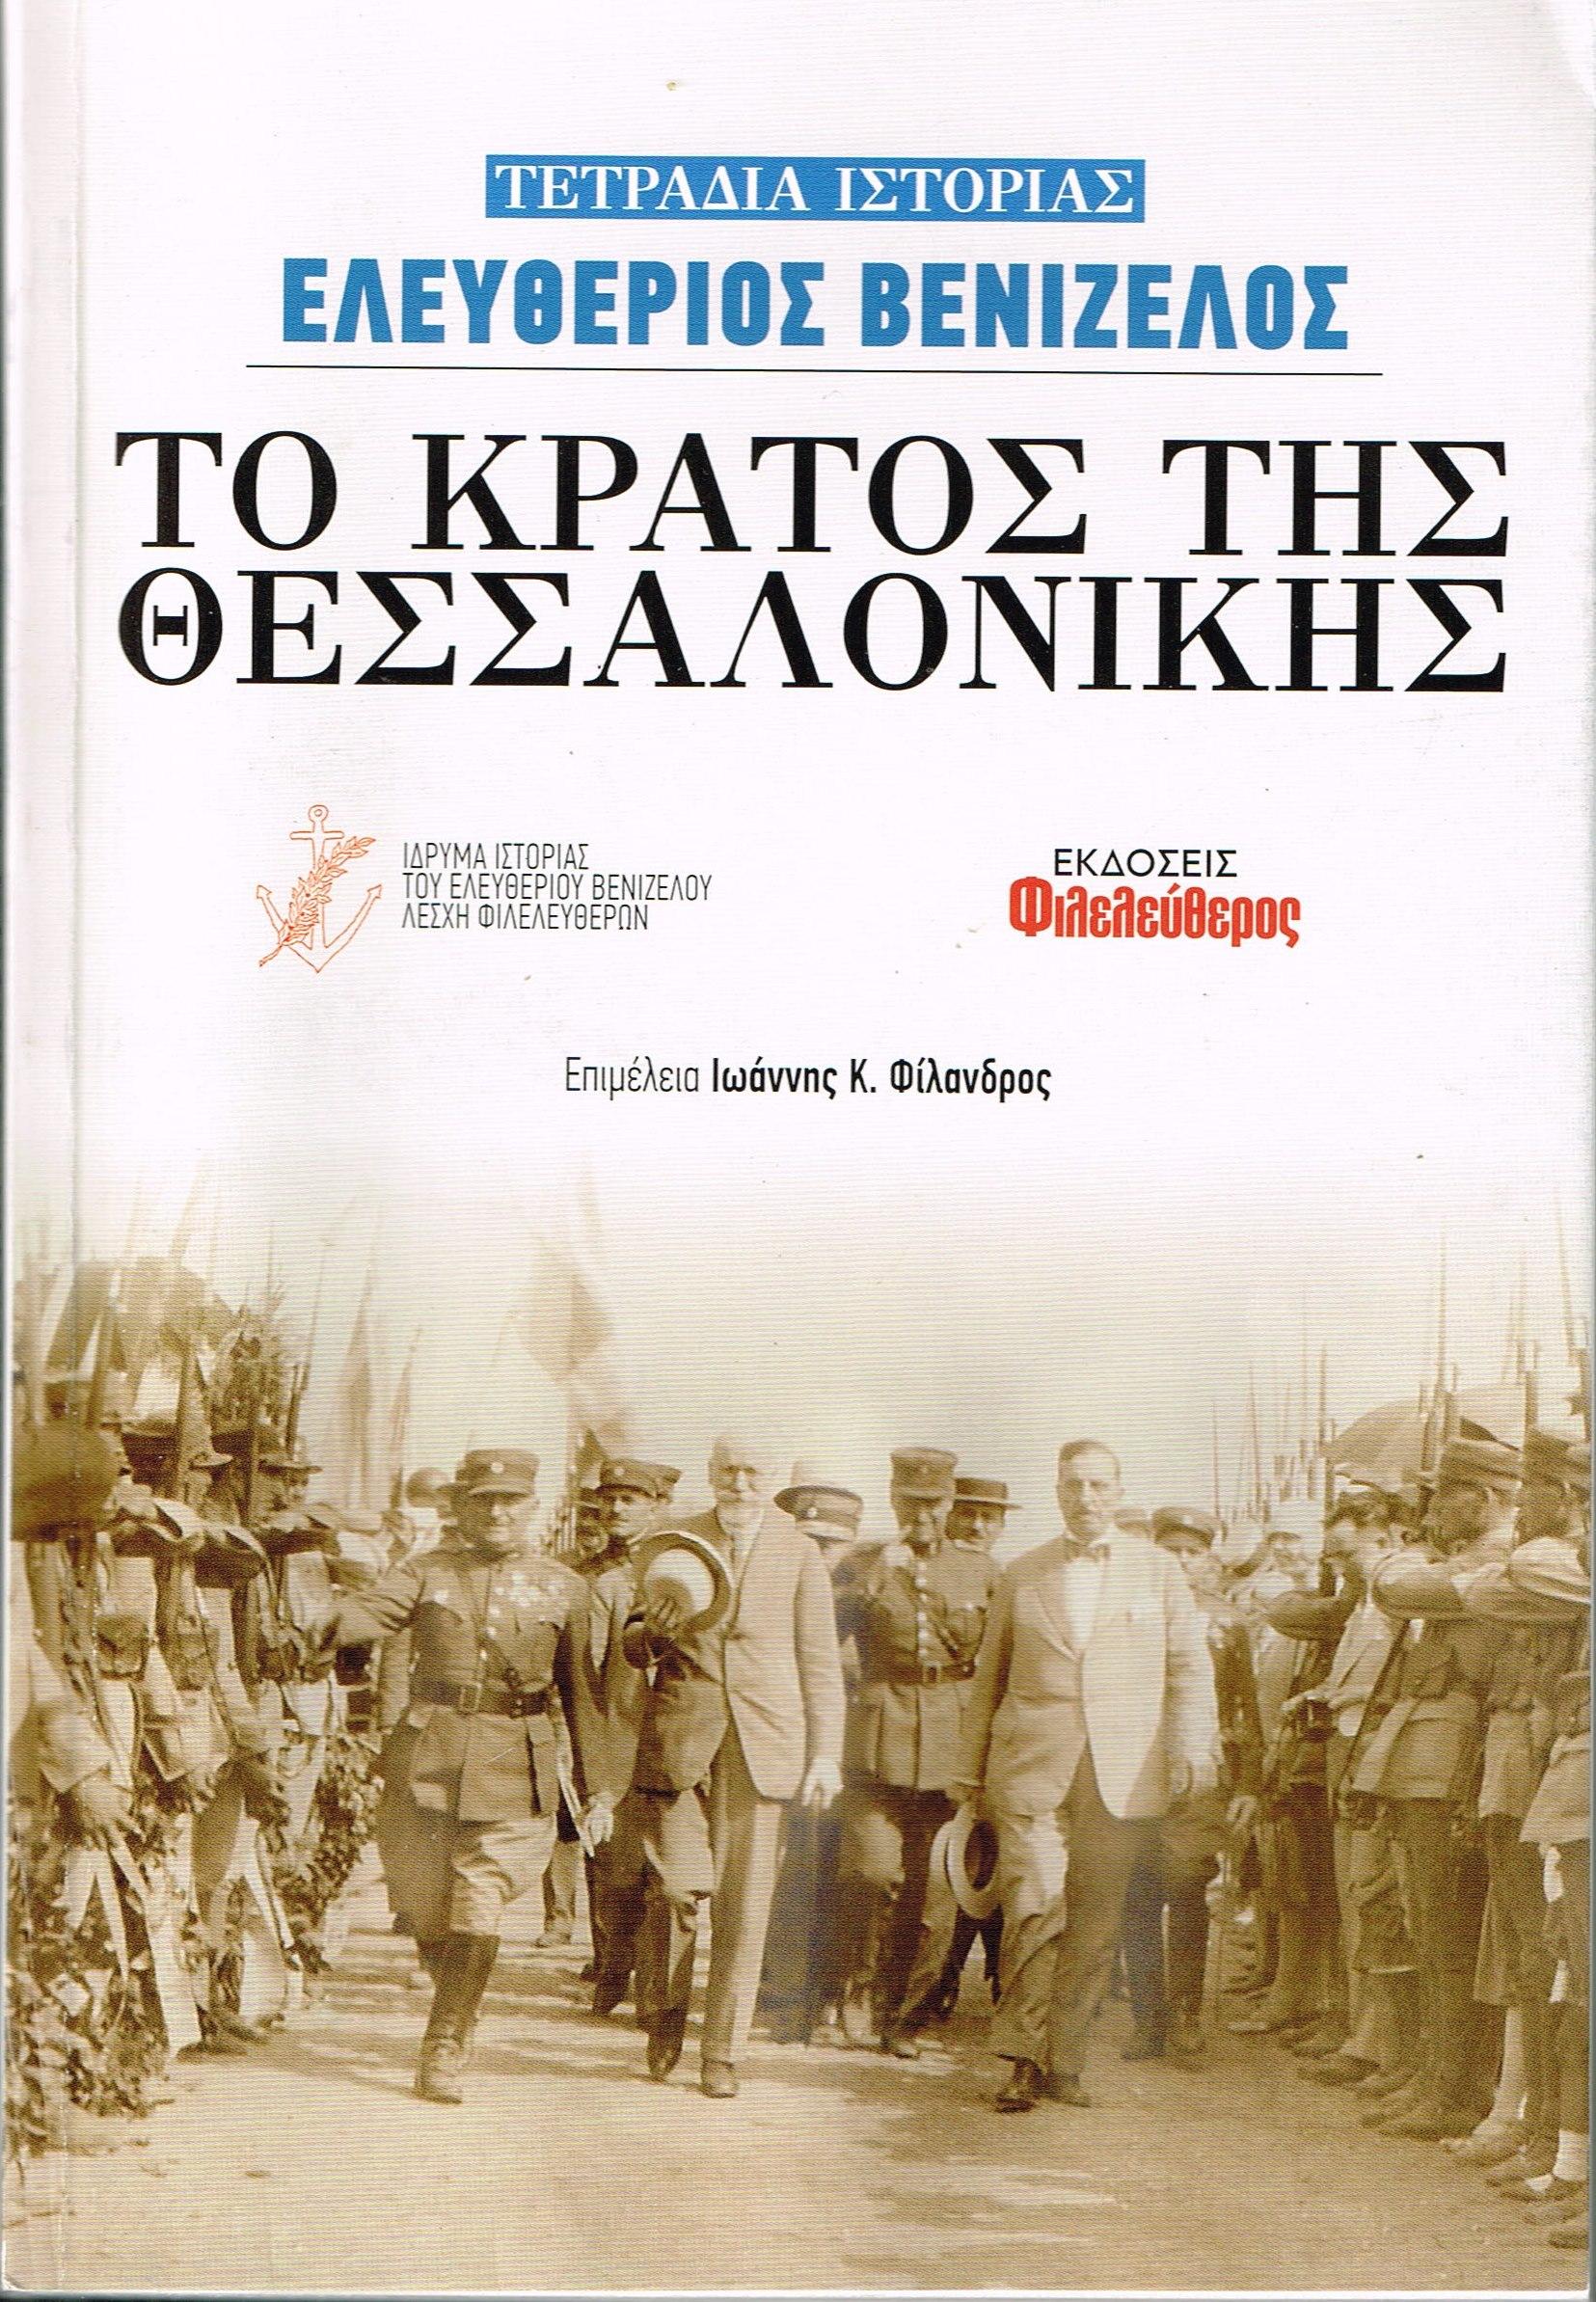 Tο κράτος της Θεσσαλονίκης, Tετράδια ιστορίας : Ελευθέριος Βενιζέλος, , Φιλελεύθερος Τύπος Α.Ε., 2020